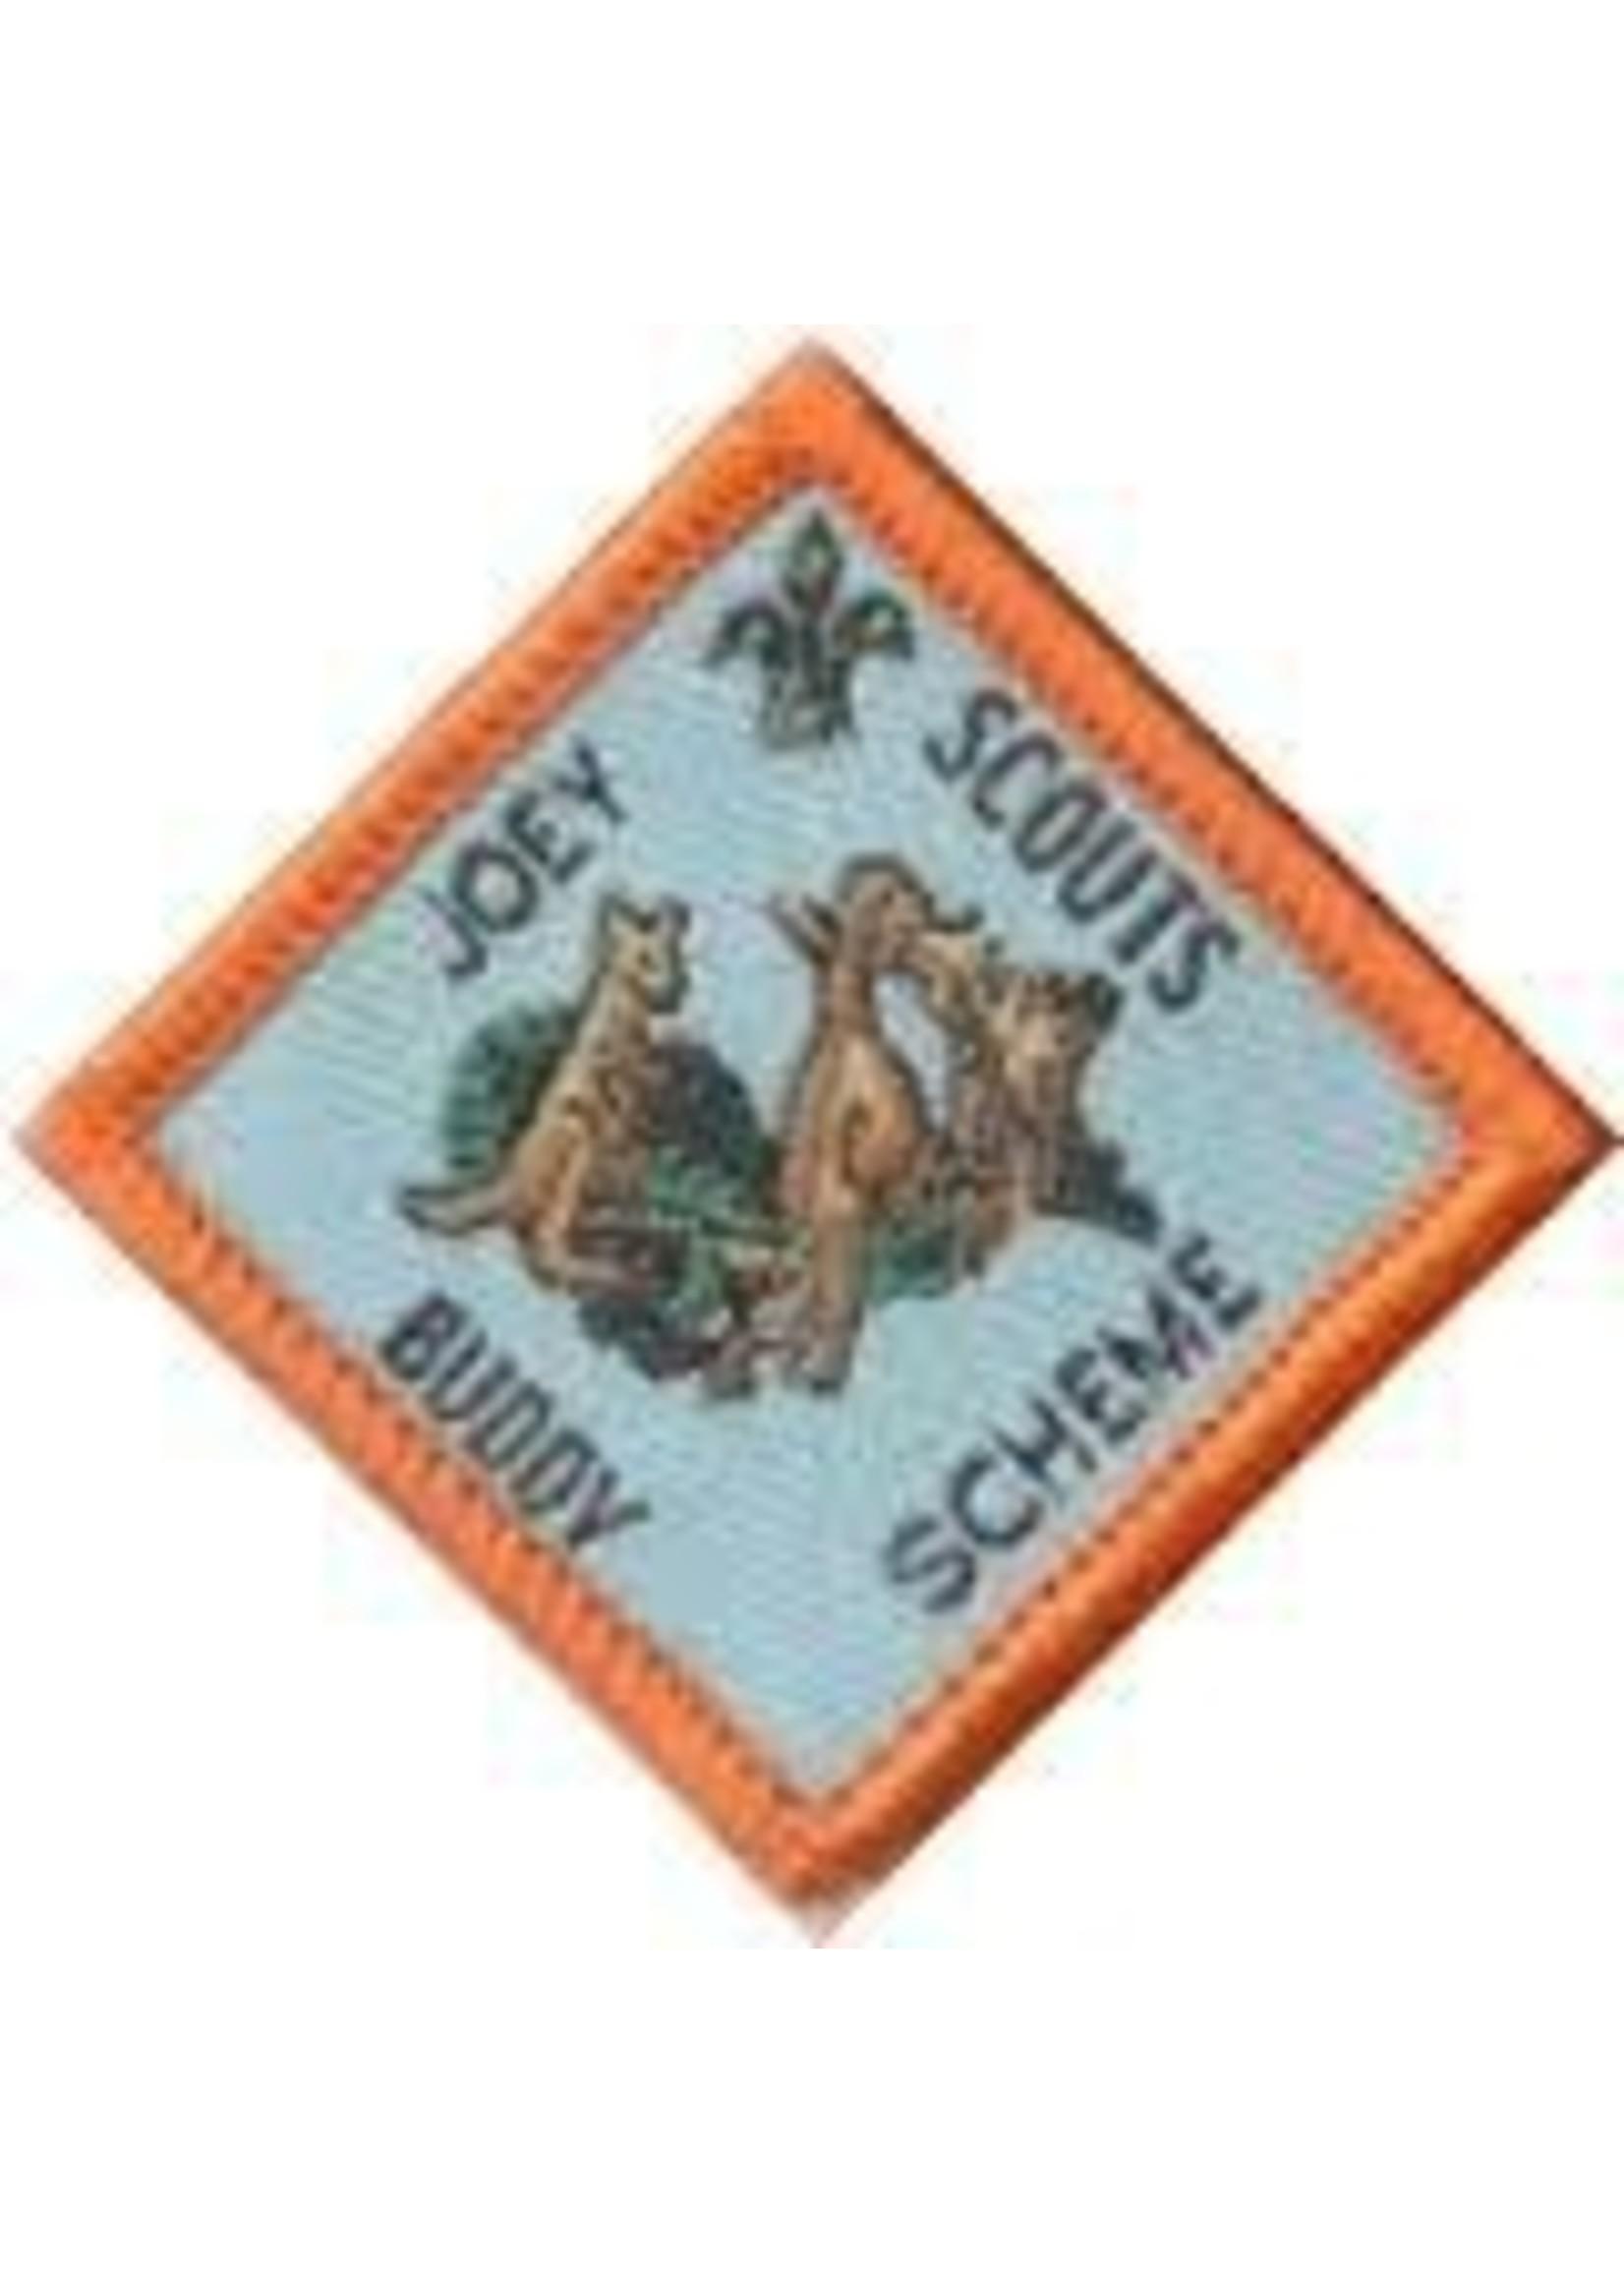 Joey Scouts - Buddy Scheme Badge